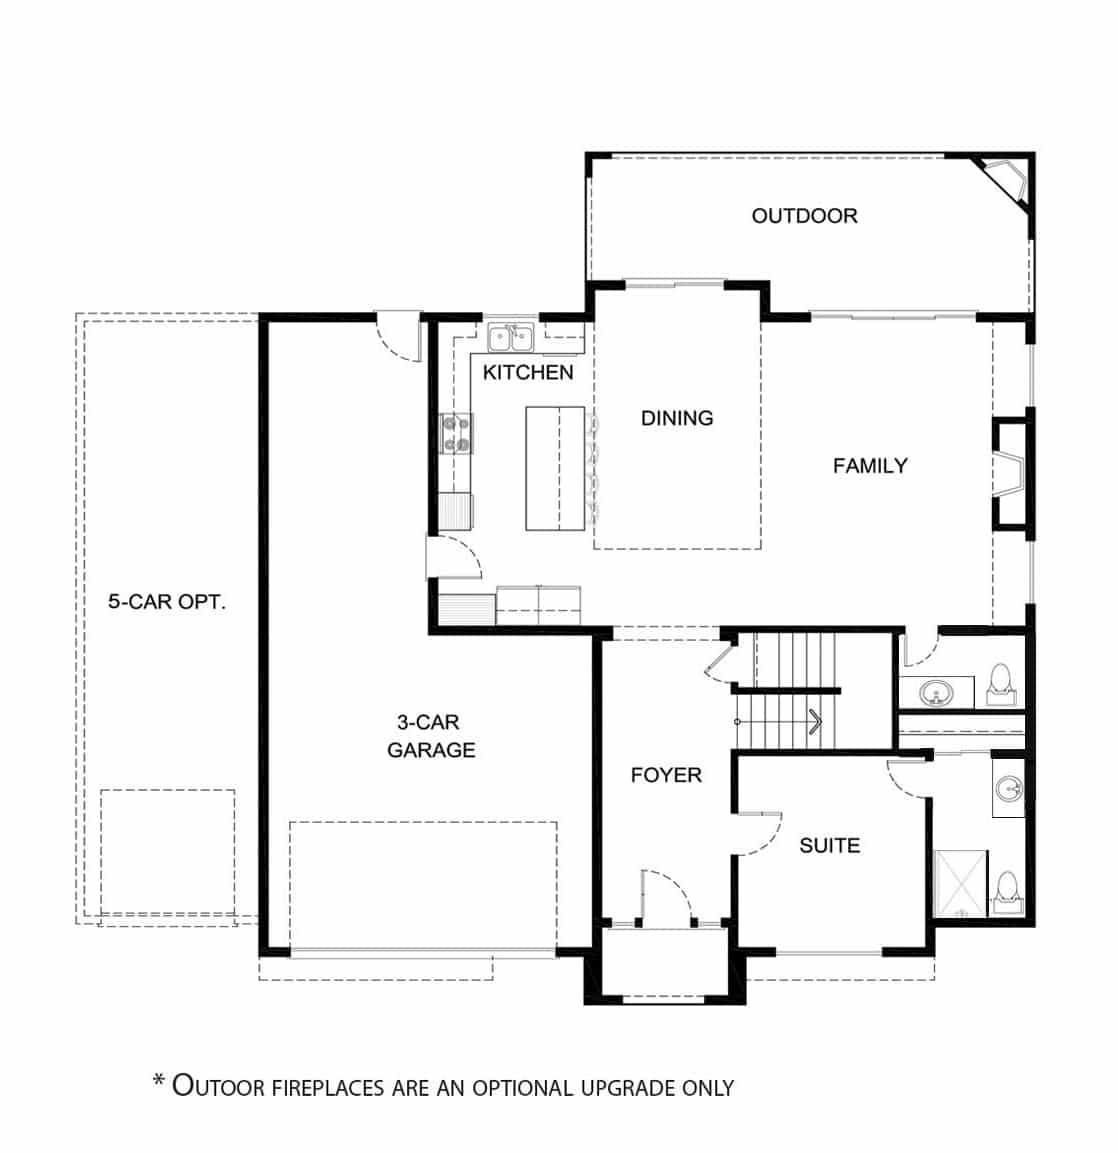 soundbuilt-annabel-floorplan-2916-elk-run-lower-level